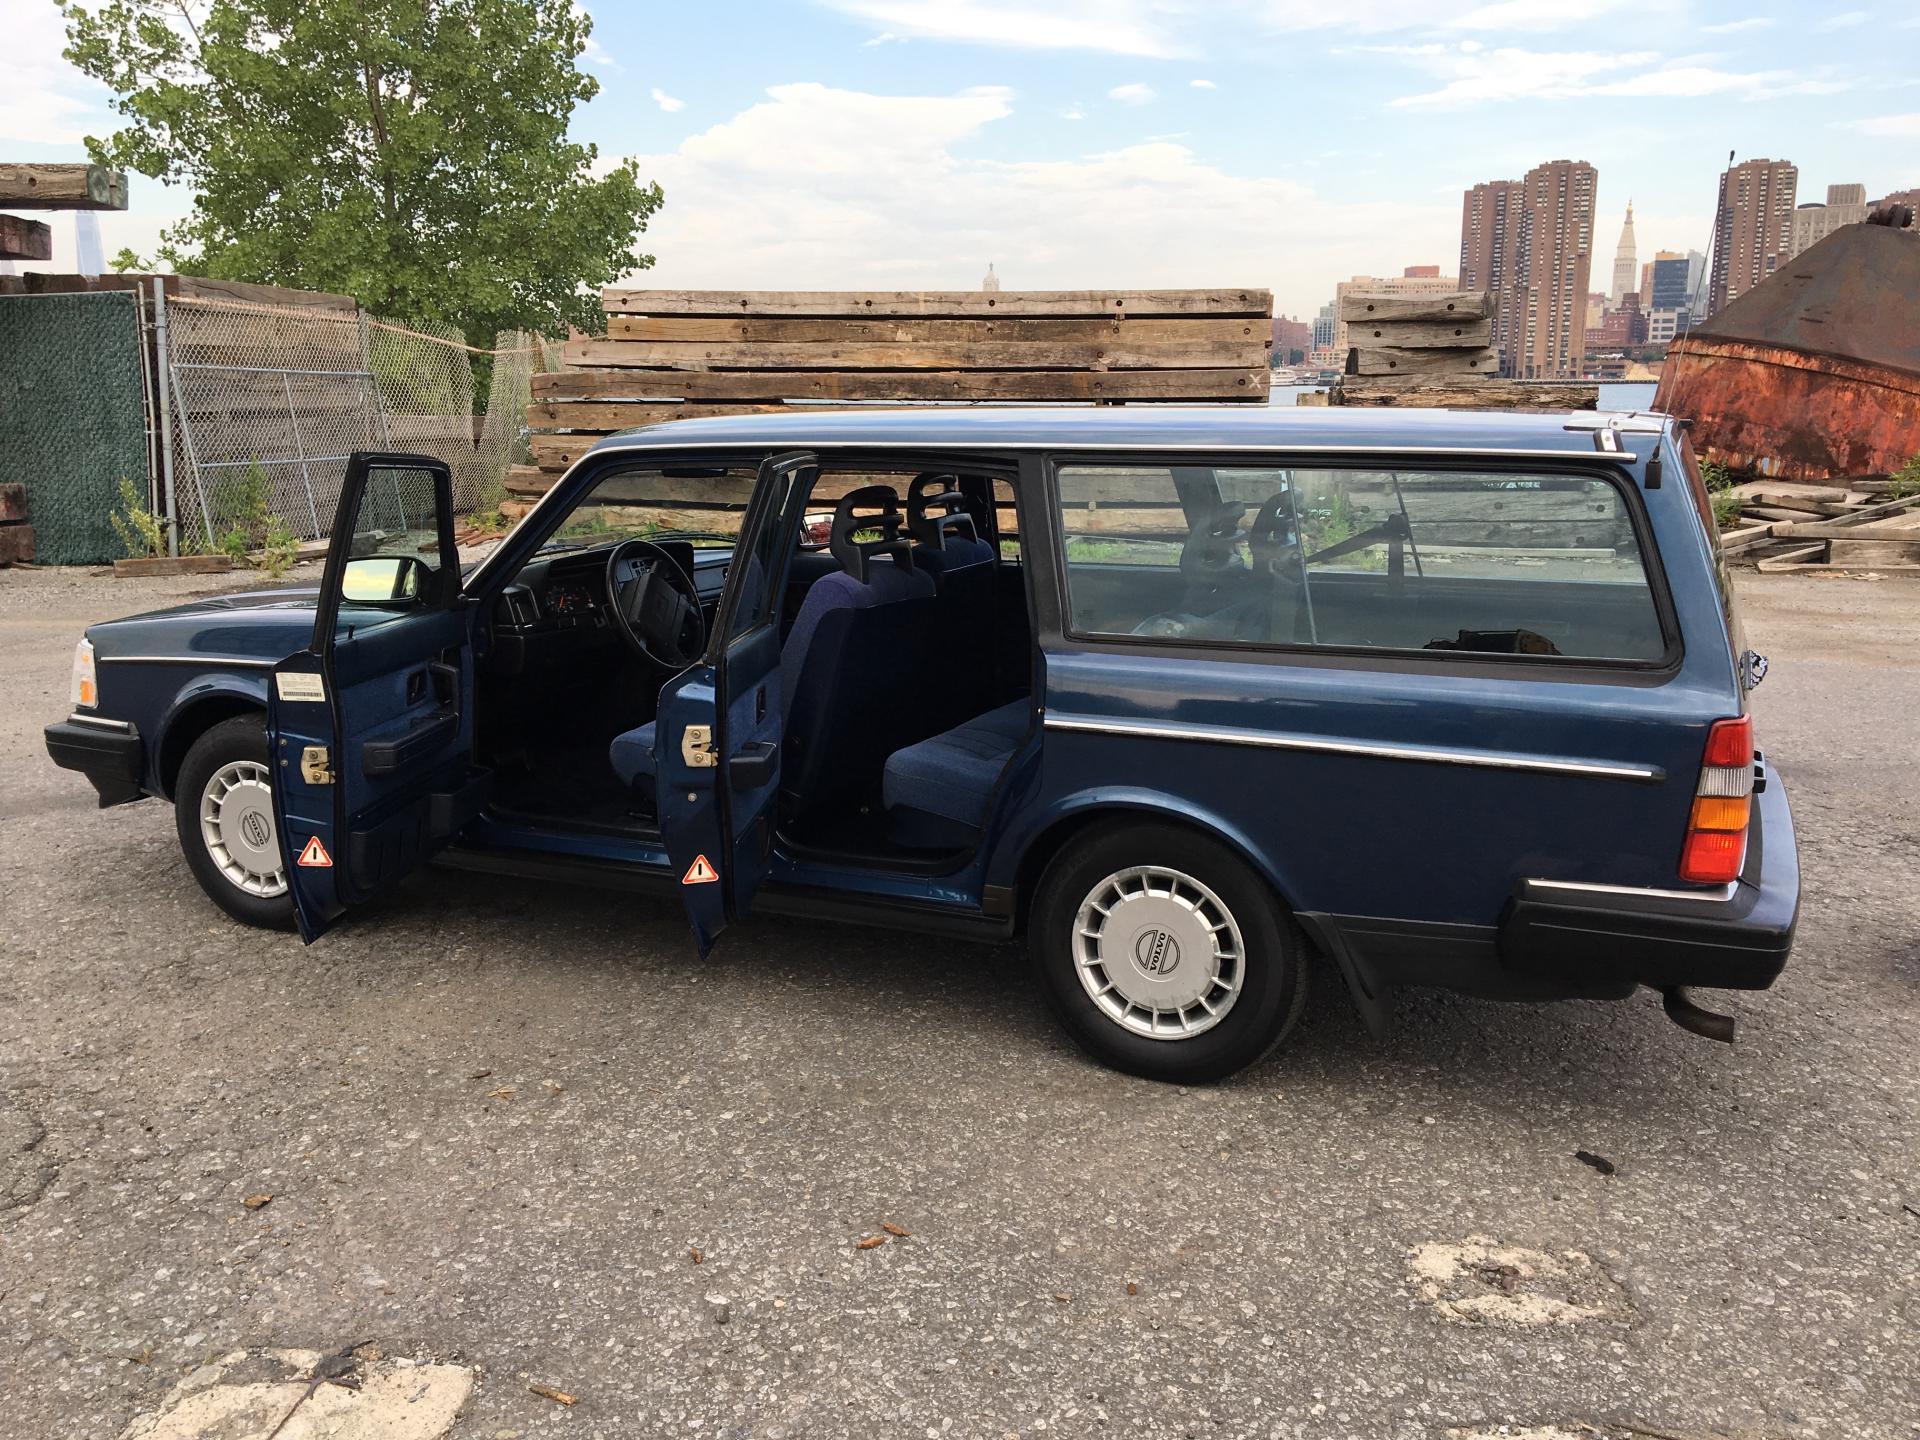 1991 VOLVO 240 WAGON 3RD ROW NON-SMOKER CLEAN CARFAX MUST ...   1991 Volvo 240 Wagon